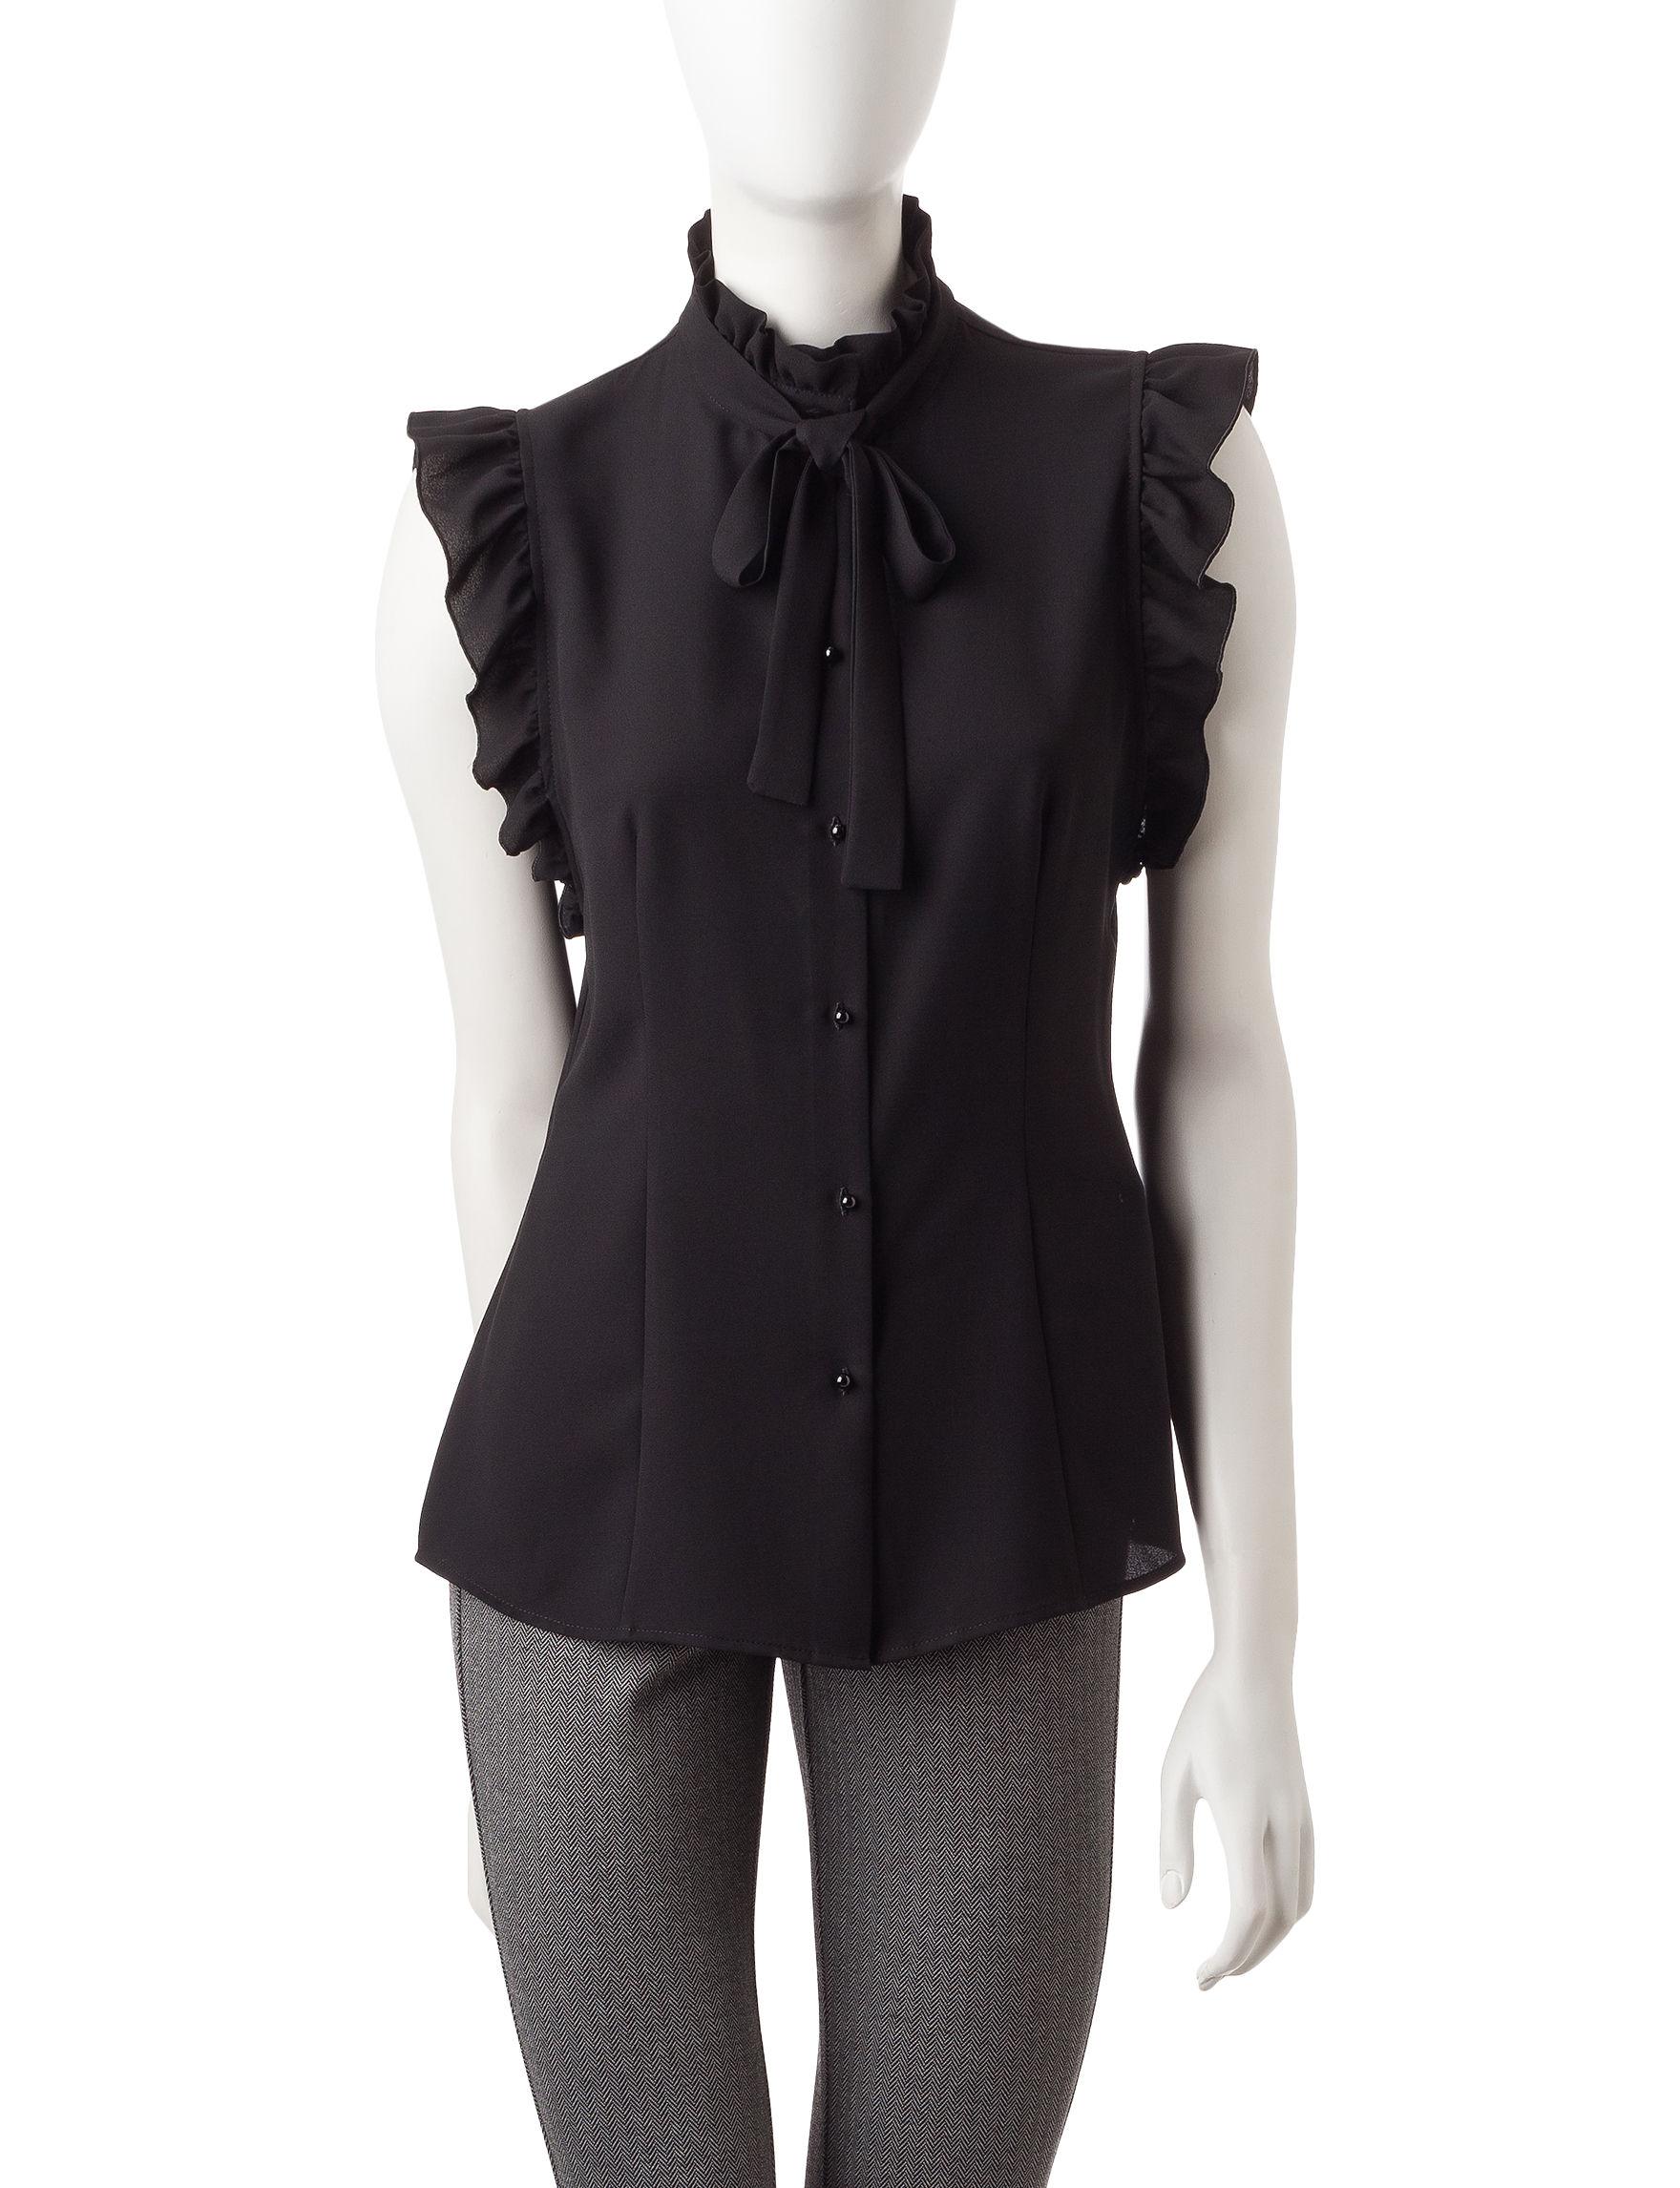 Anne Klein Black Shirts & Blouses